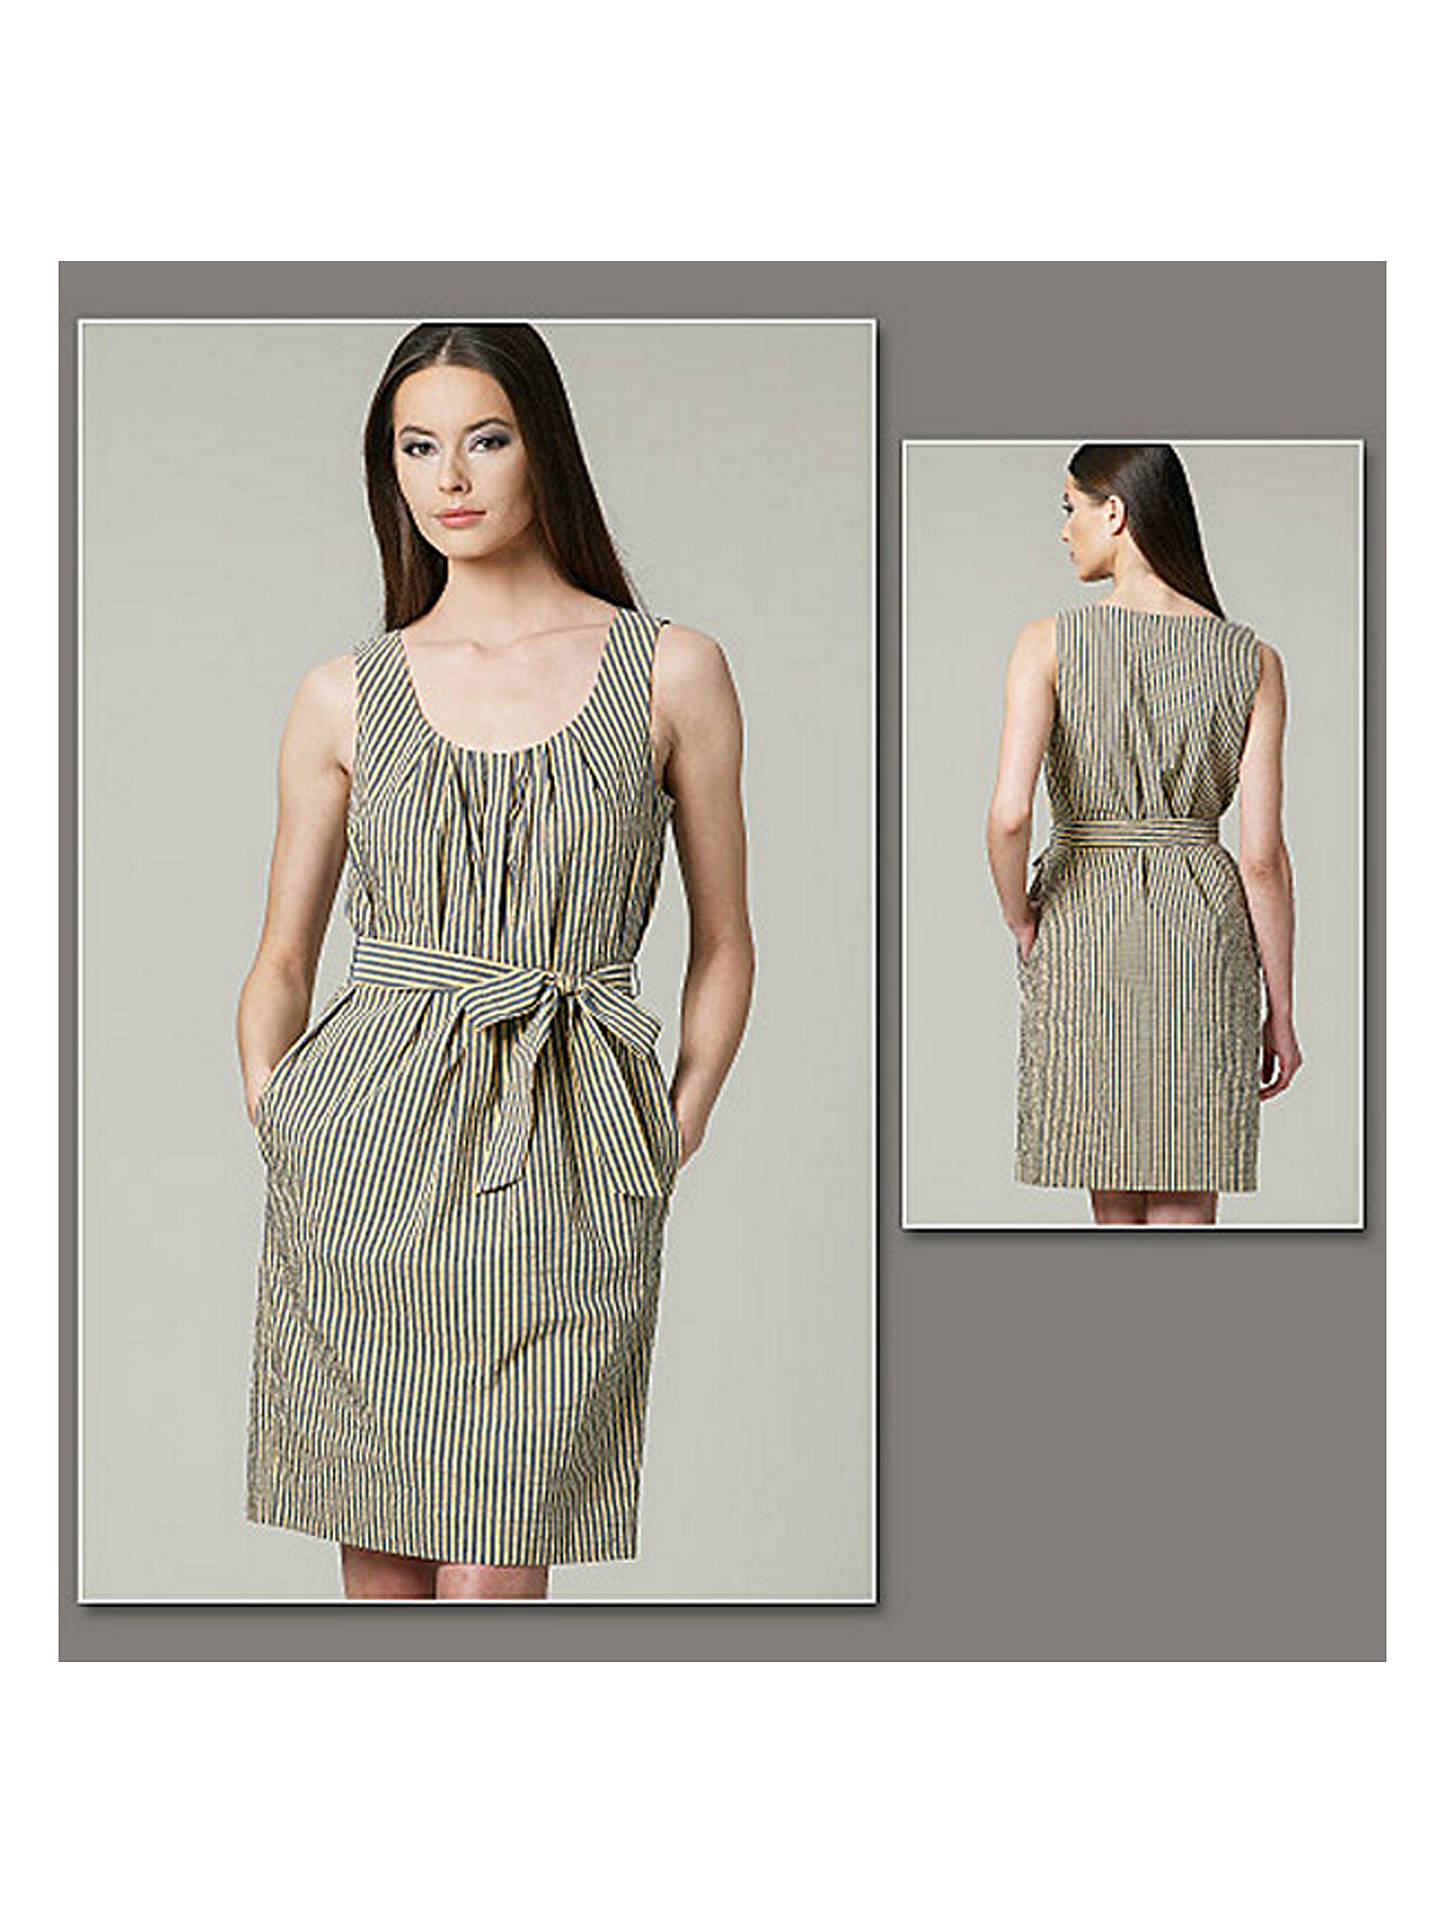 0c0f9ffb100 Buy Vogue DKNY Women s Dress Sewing Pattern